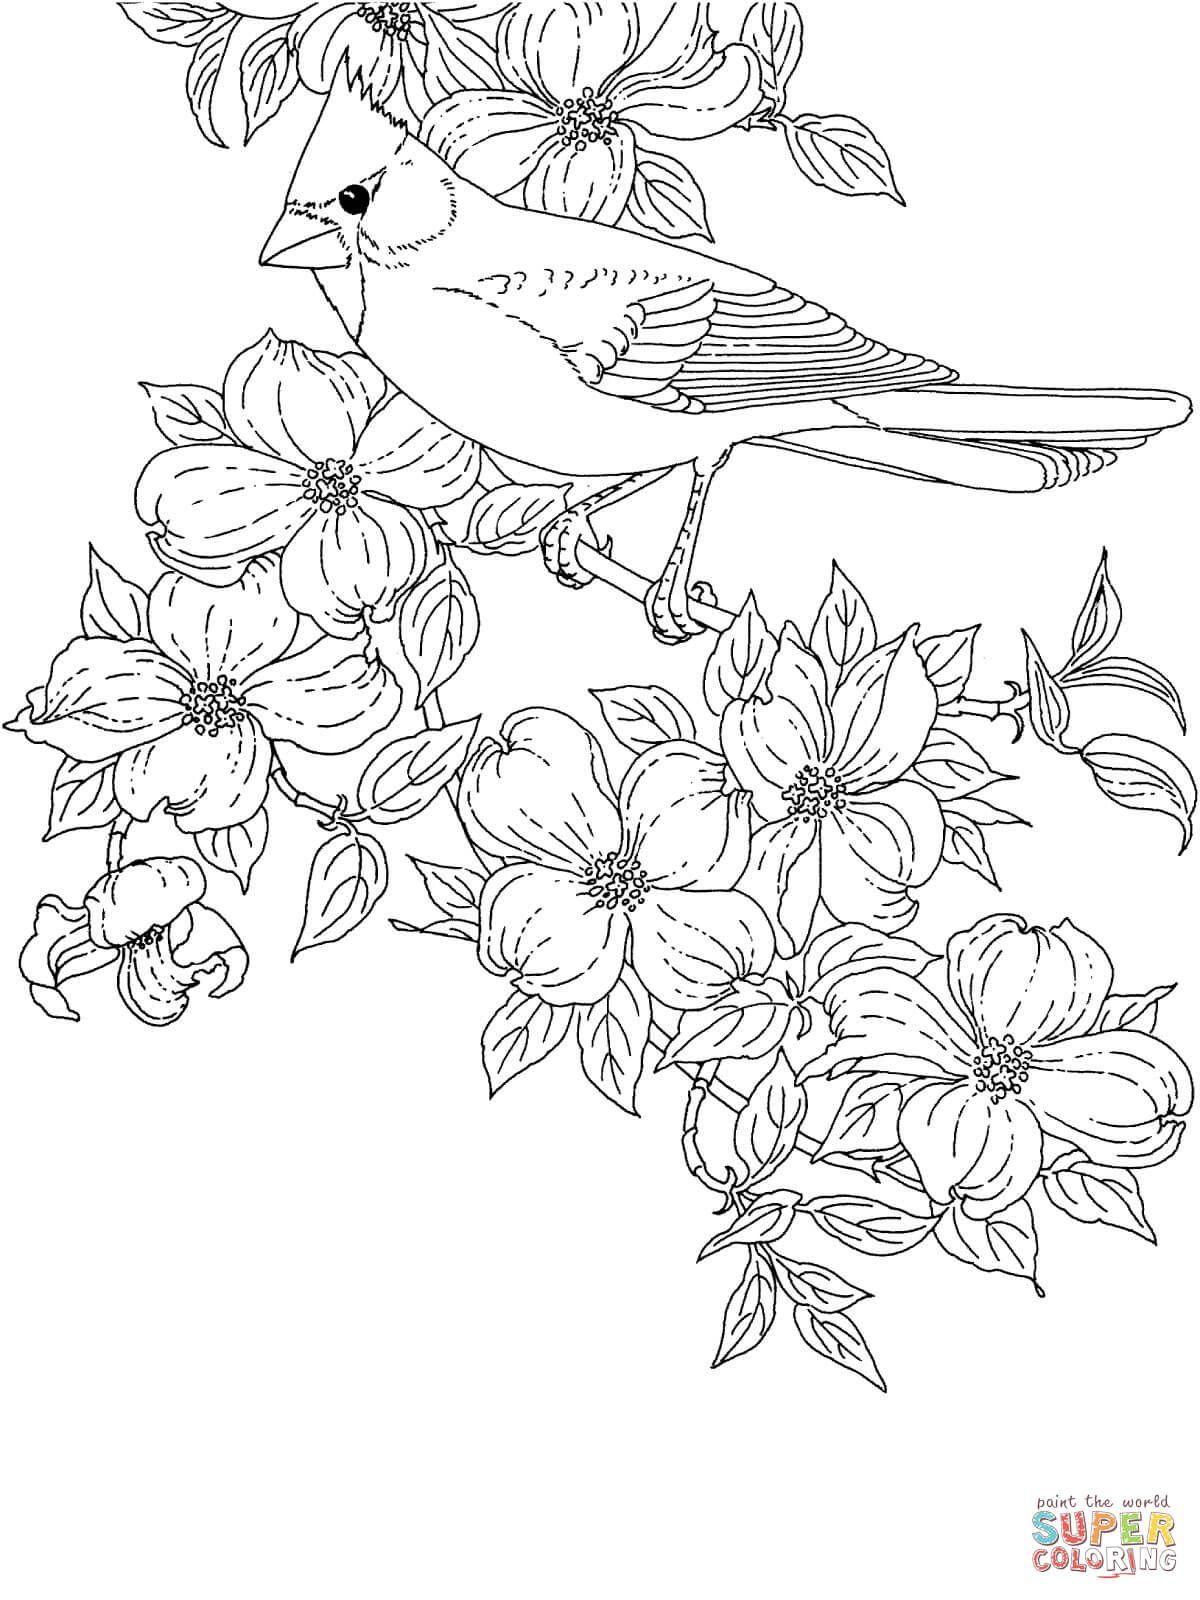 Cardinal Bird and Flowering Virginia State Flower | Super Coloring ...